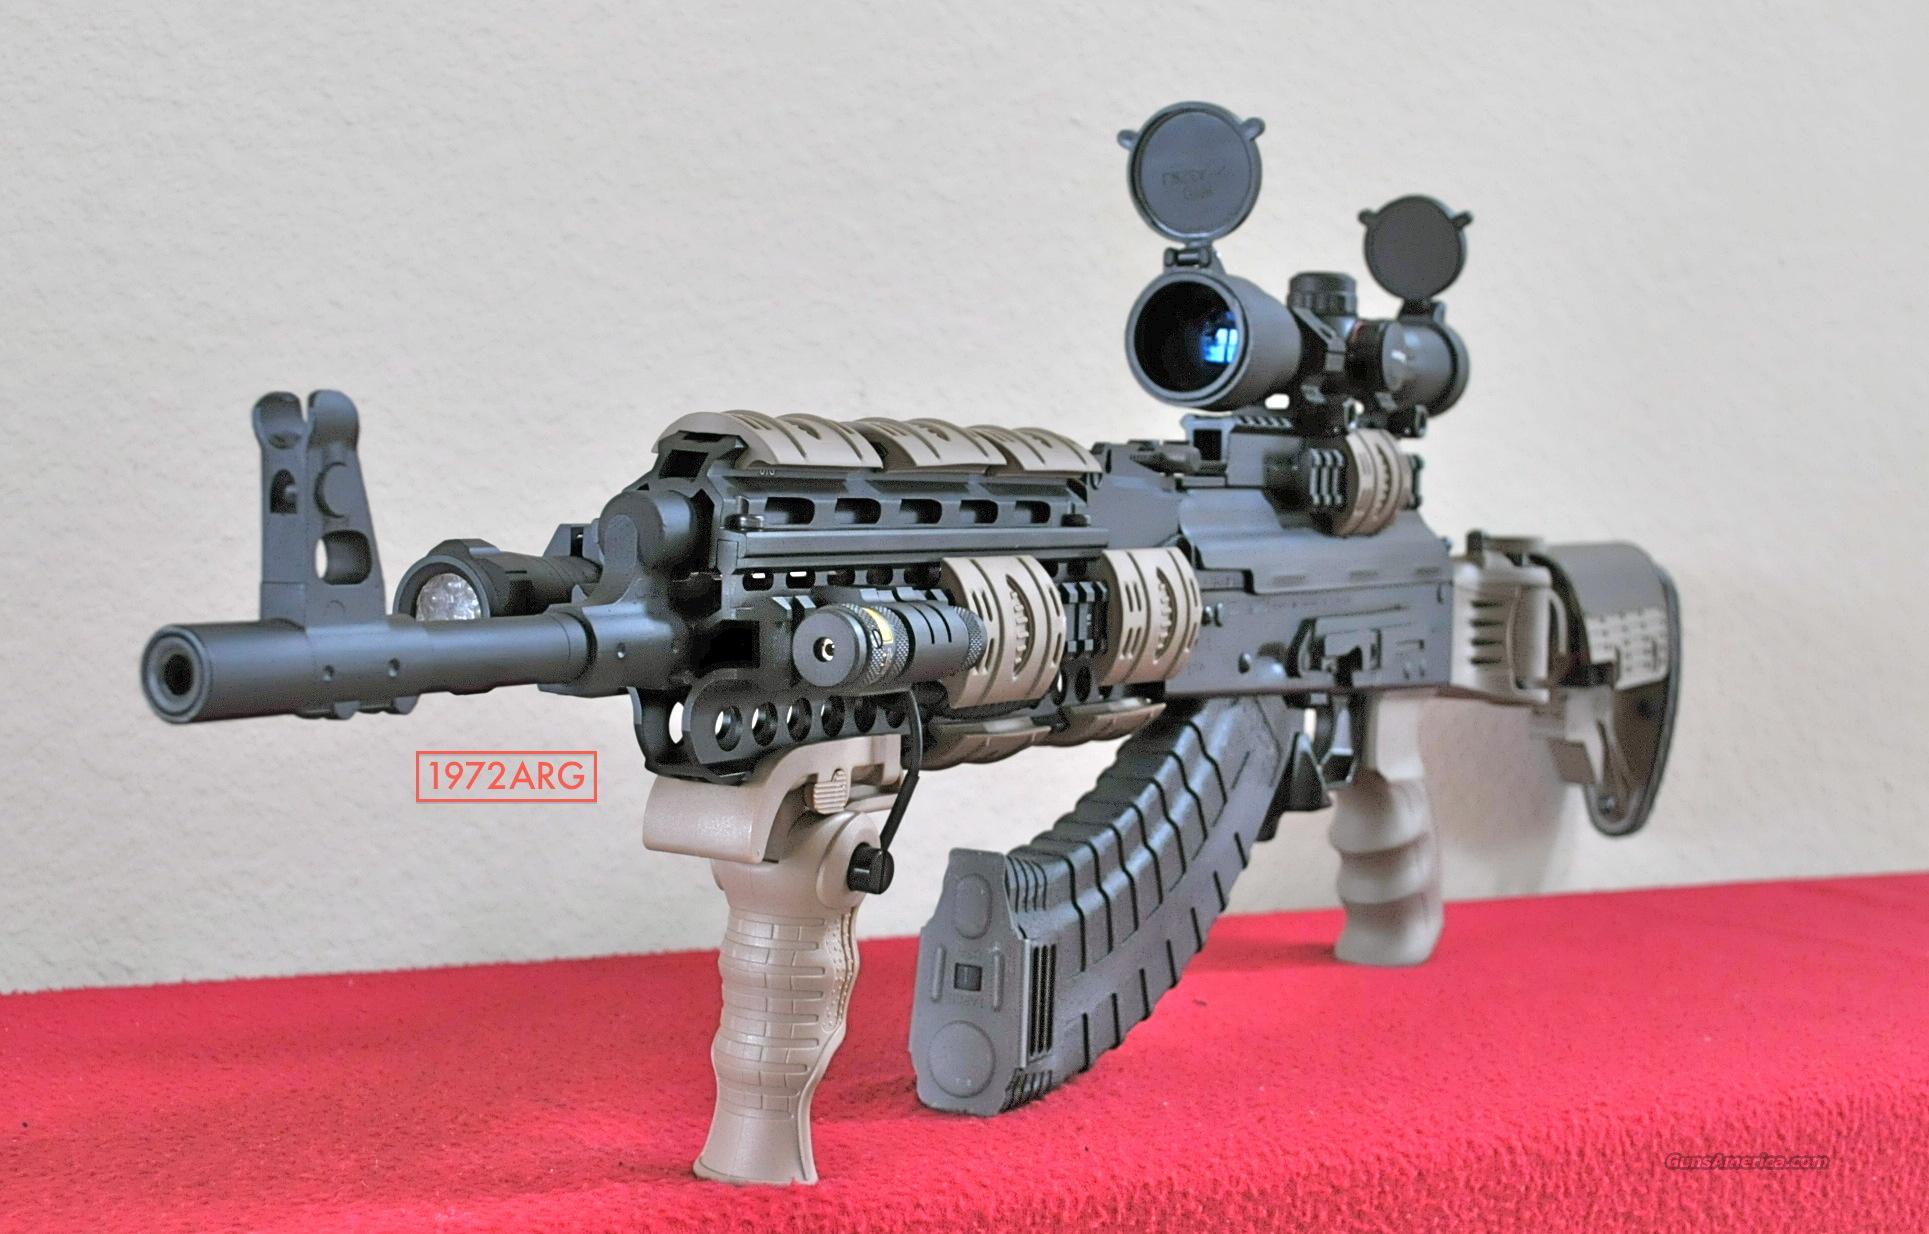 SAIGA AK 47 BELARUS TACTICAL SERIES